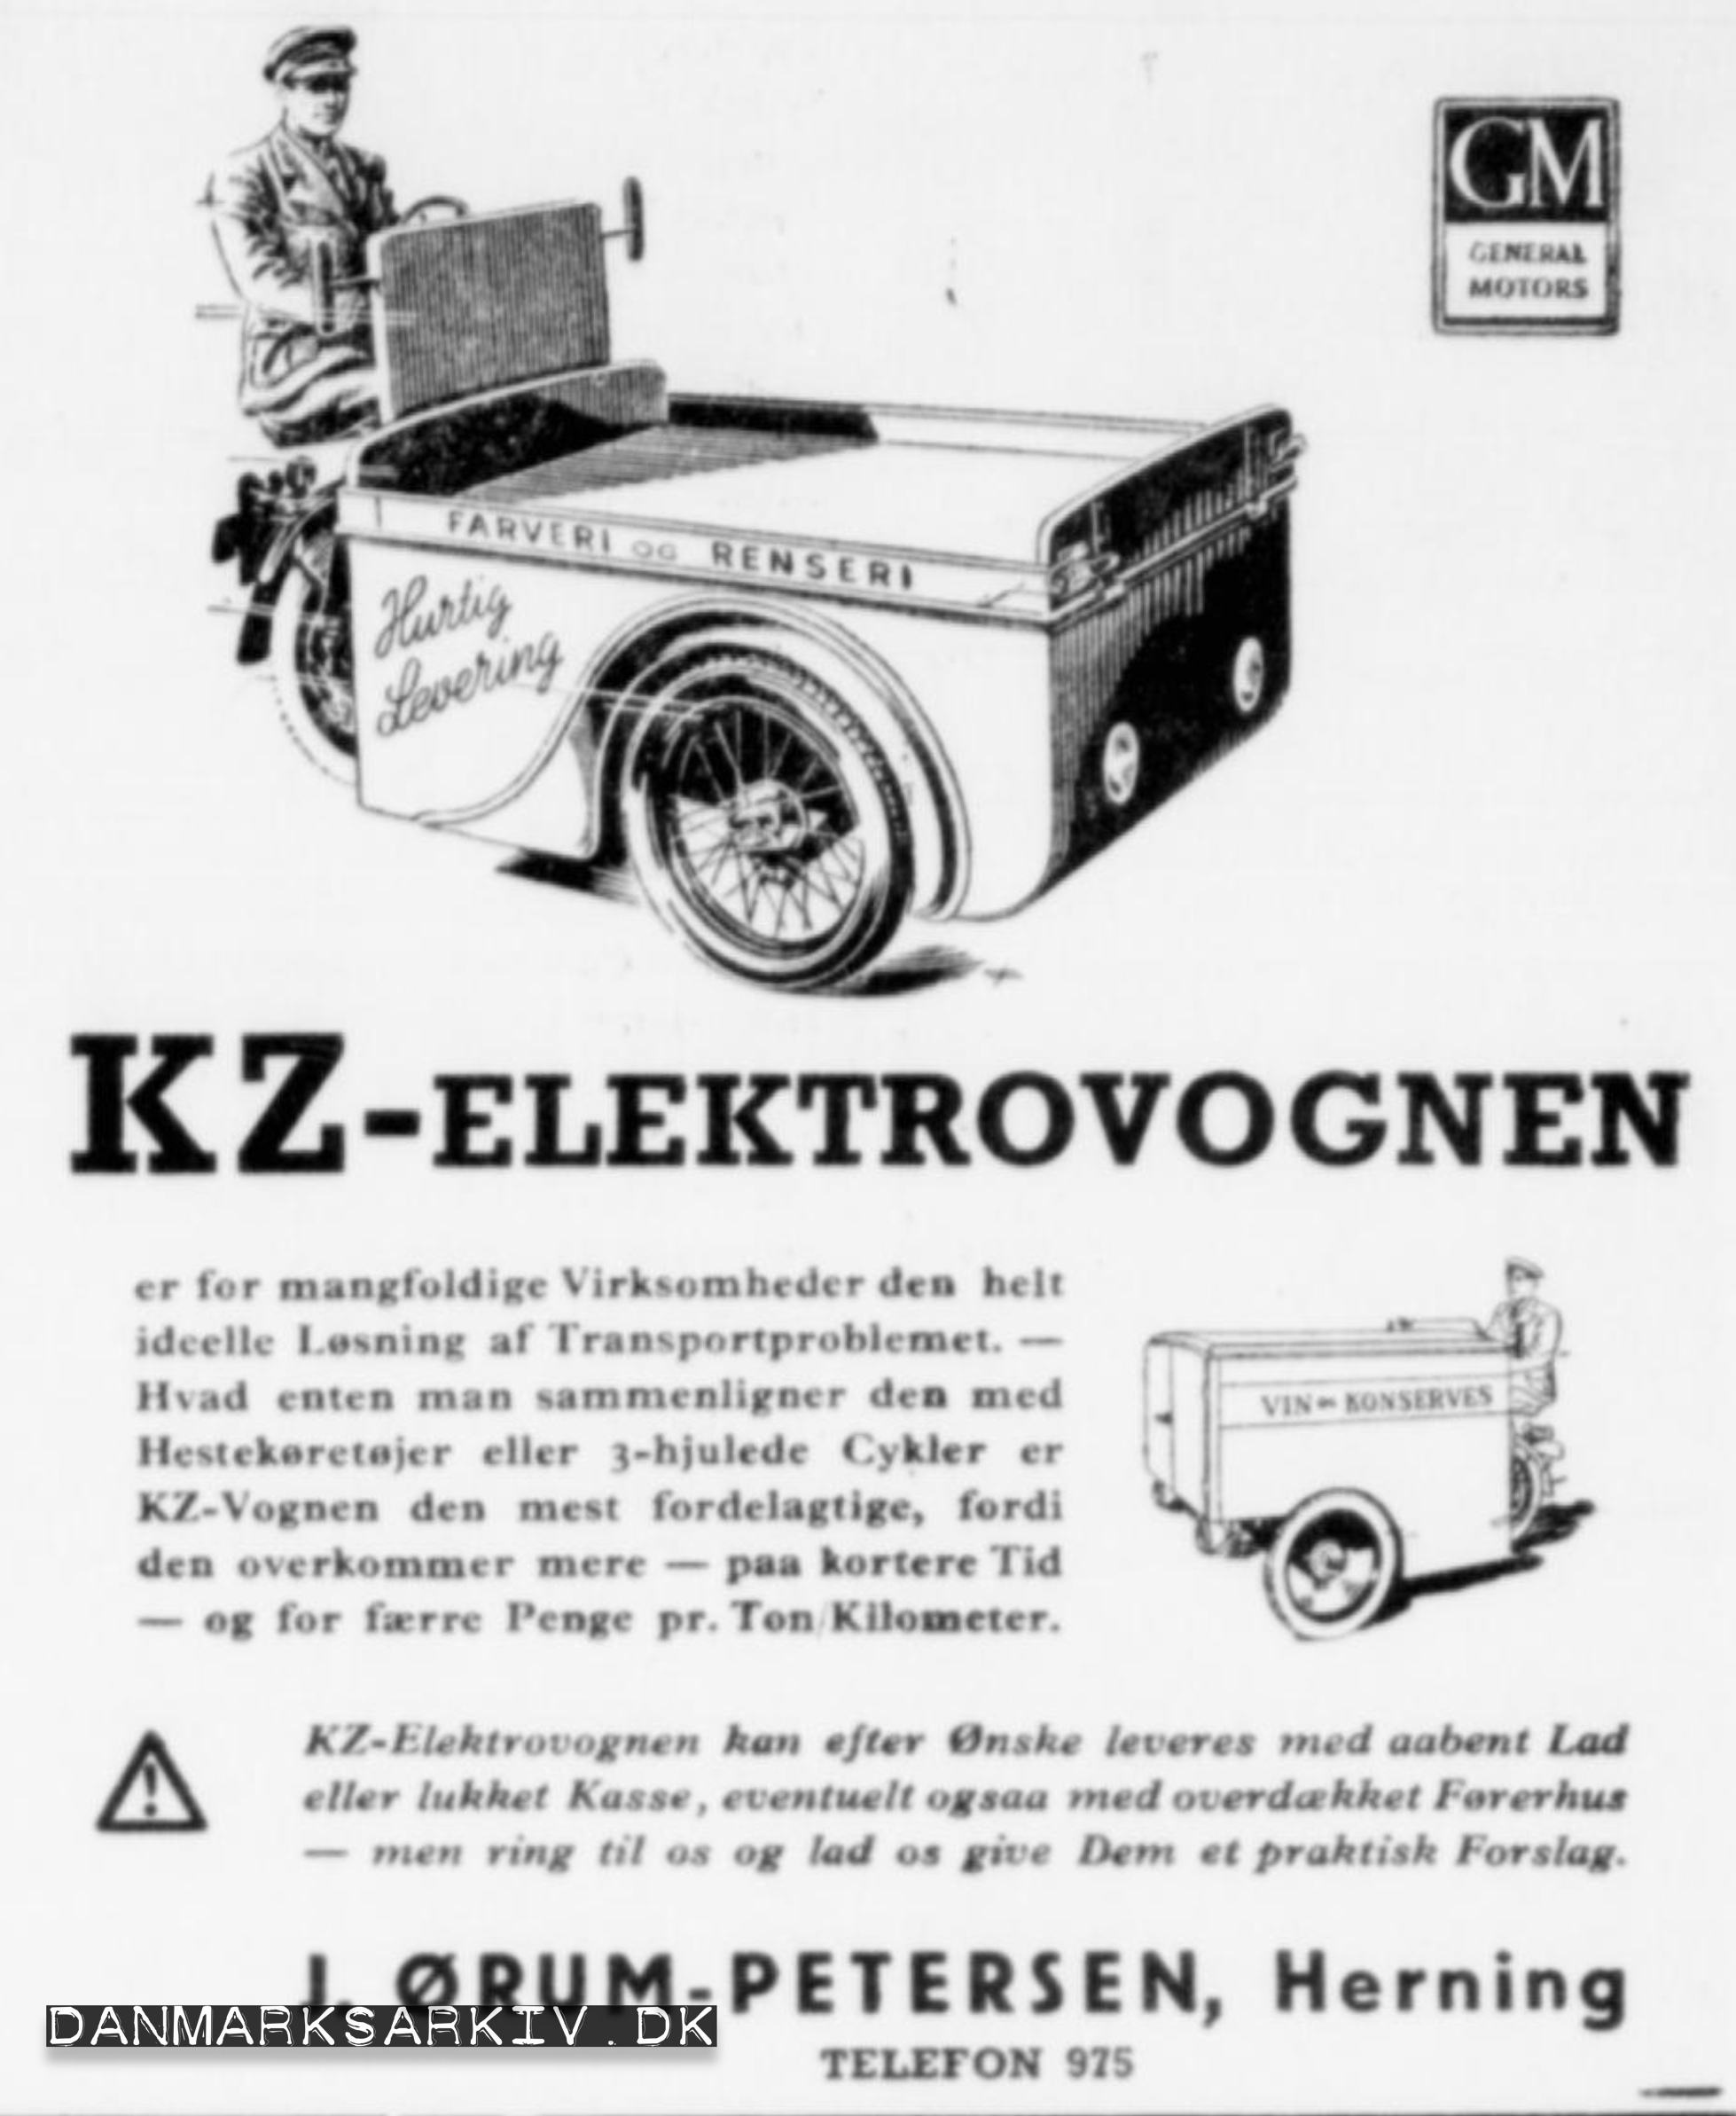 KZ-Elektrovognen - 1942